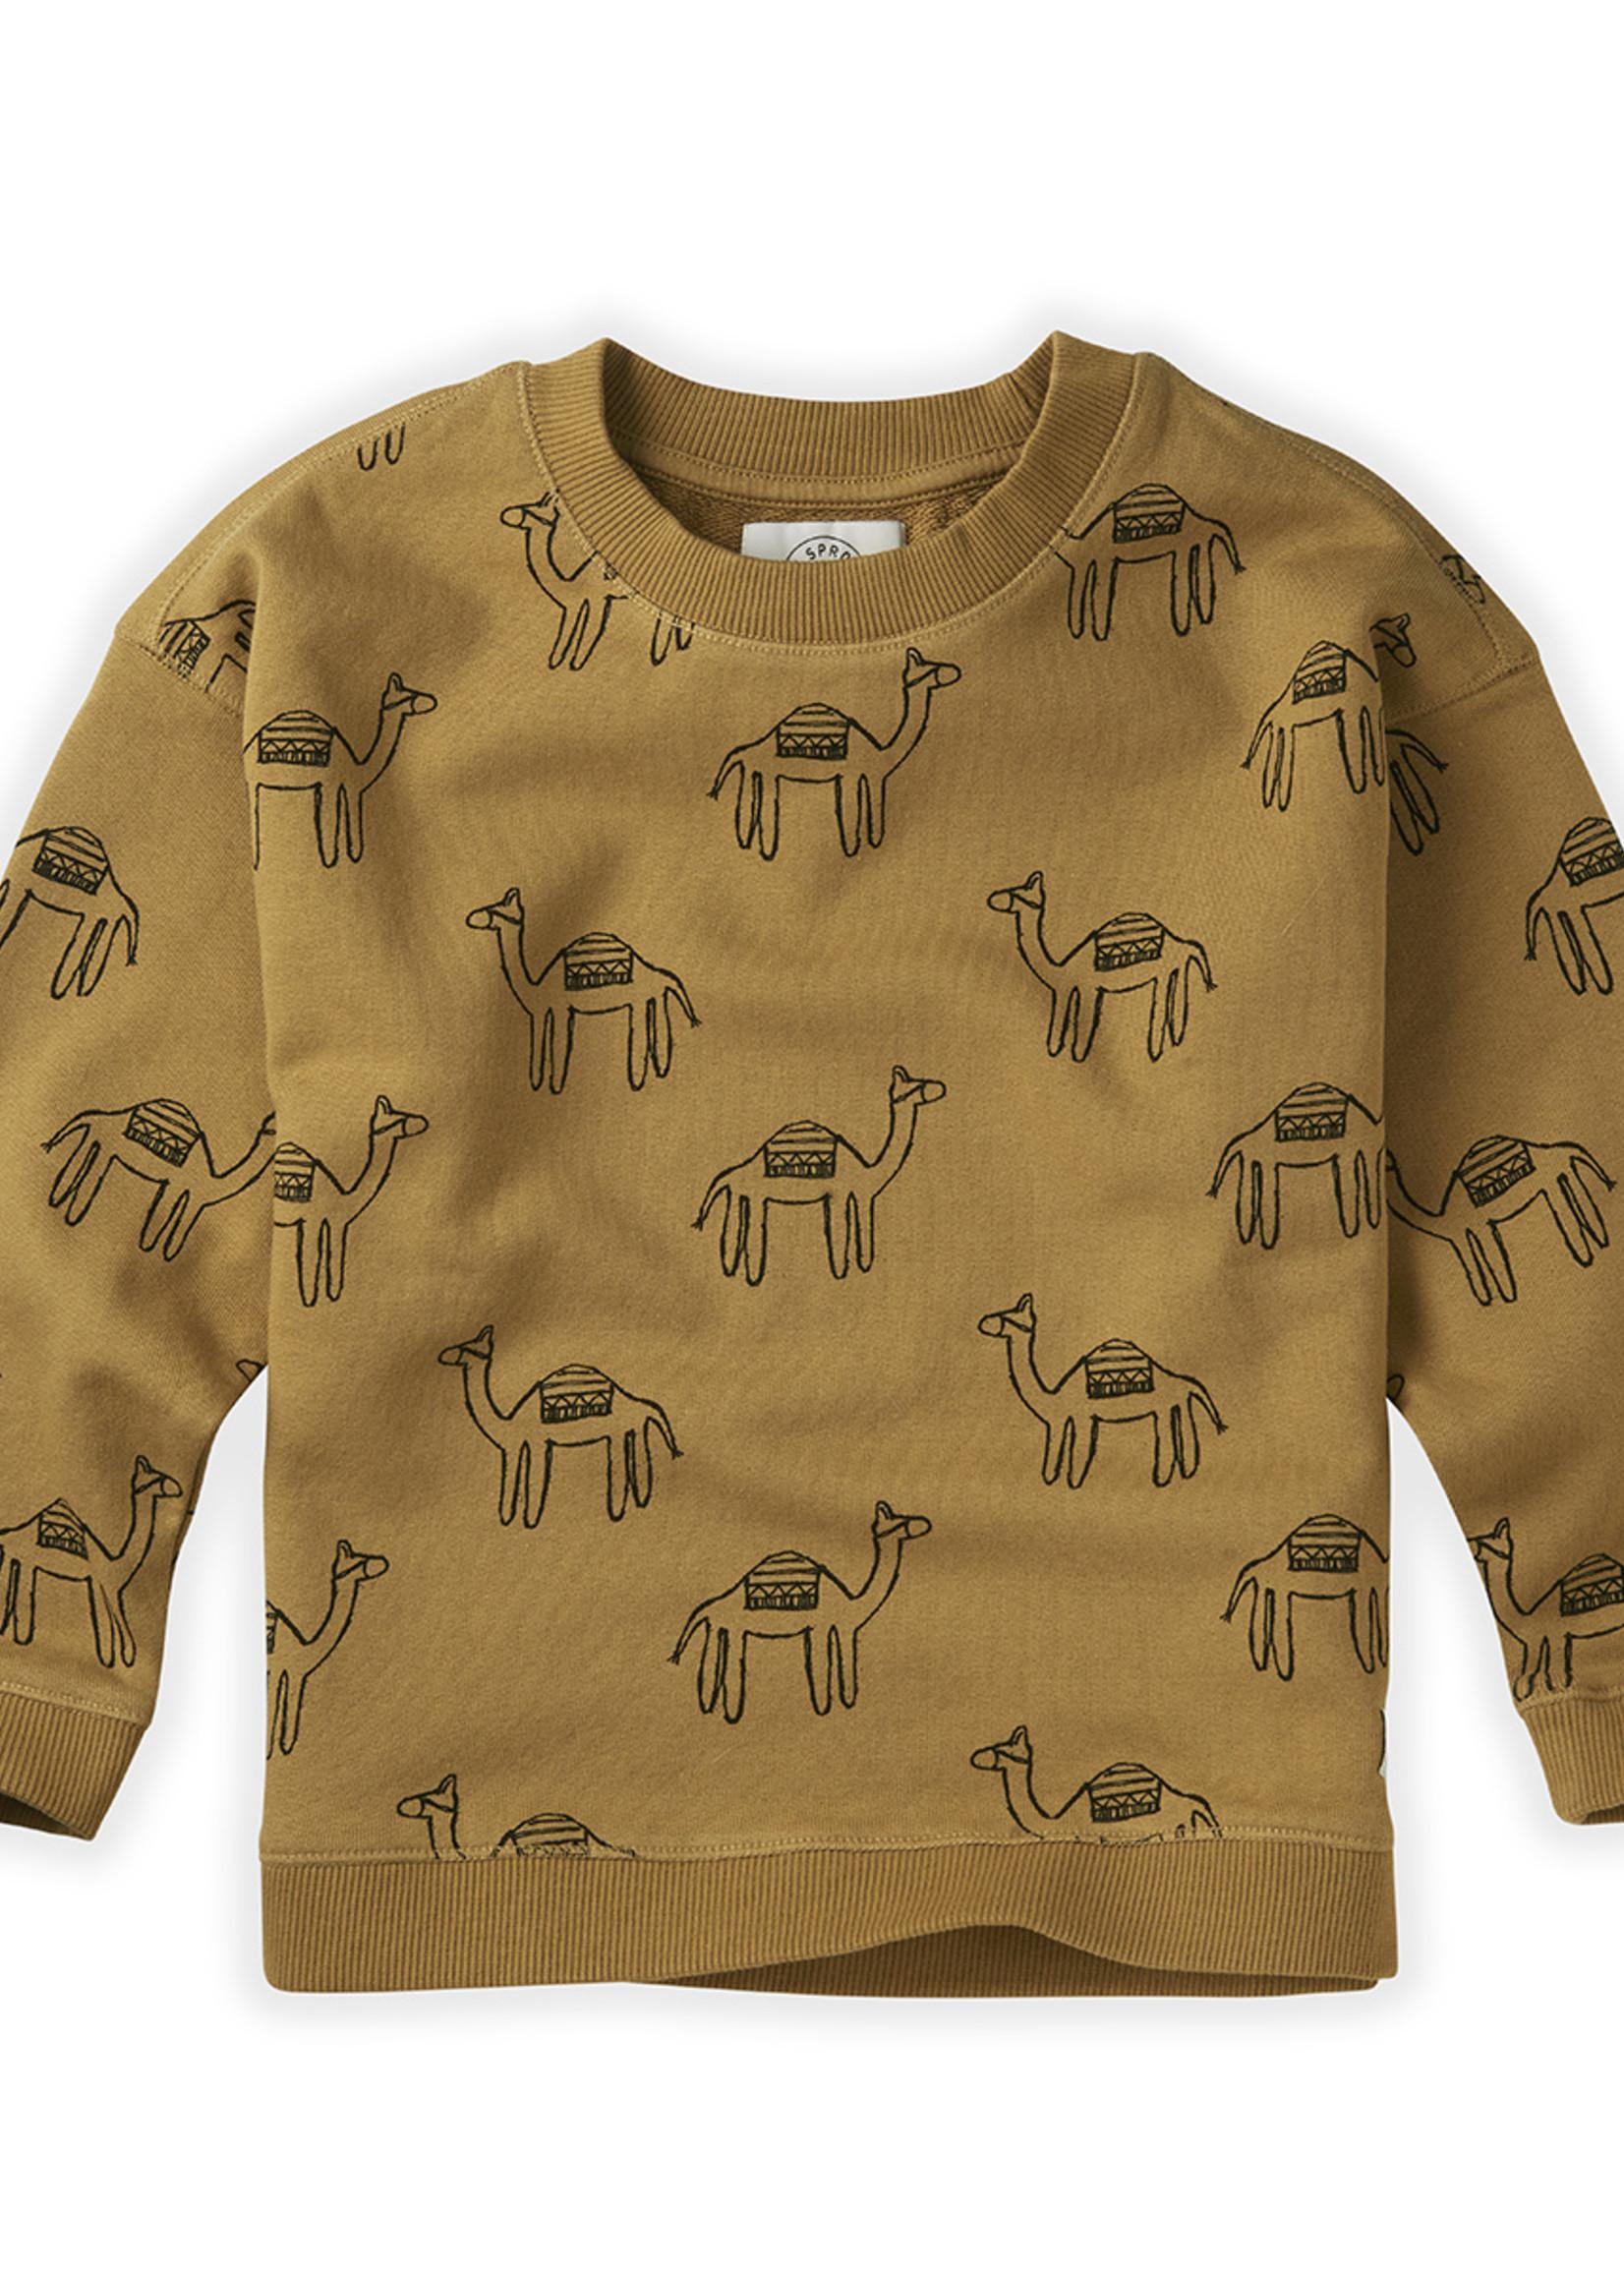 Sproet & Sprout SS - Sweatshirt Print Camel